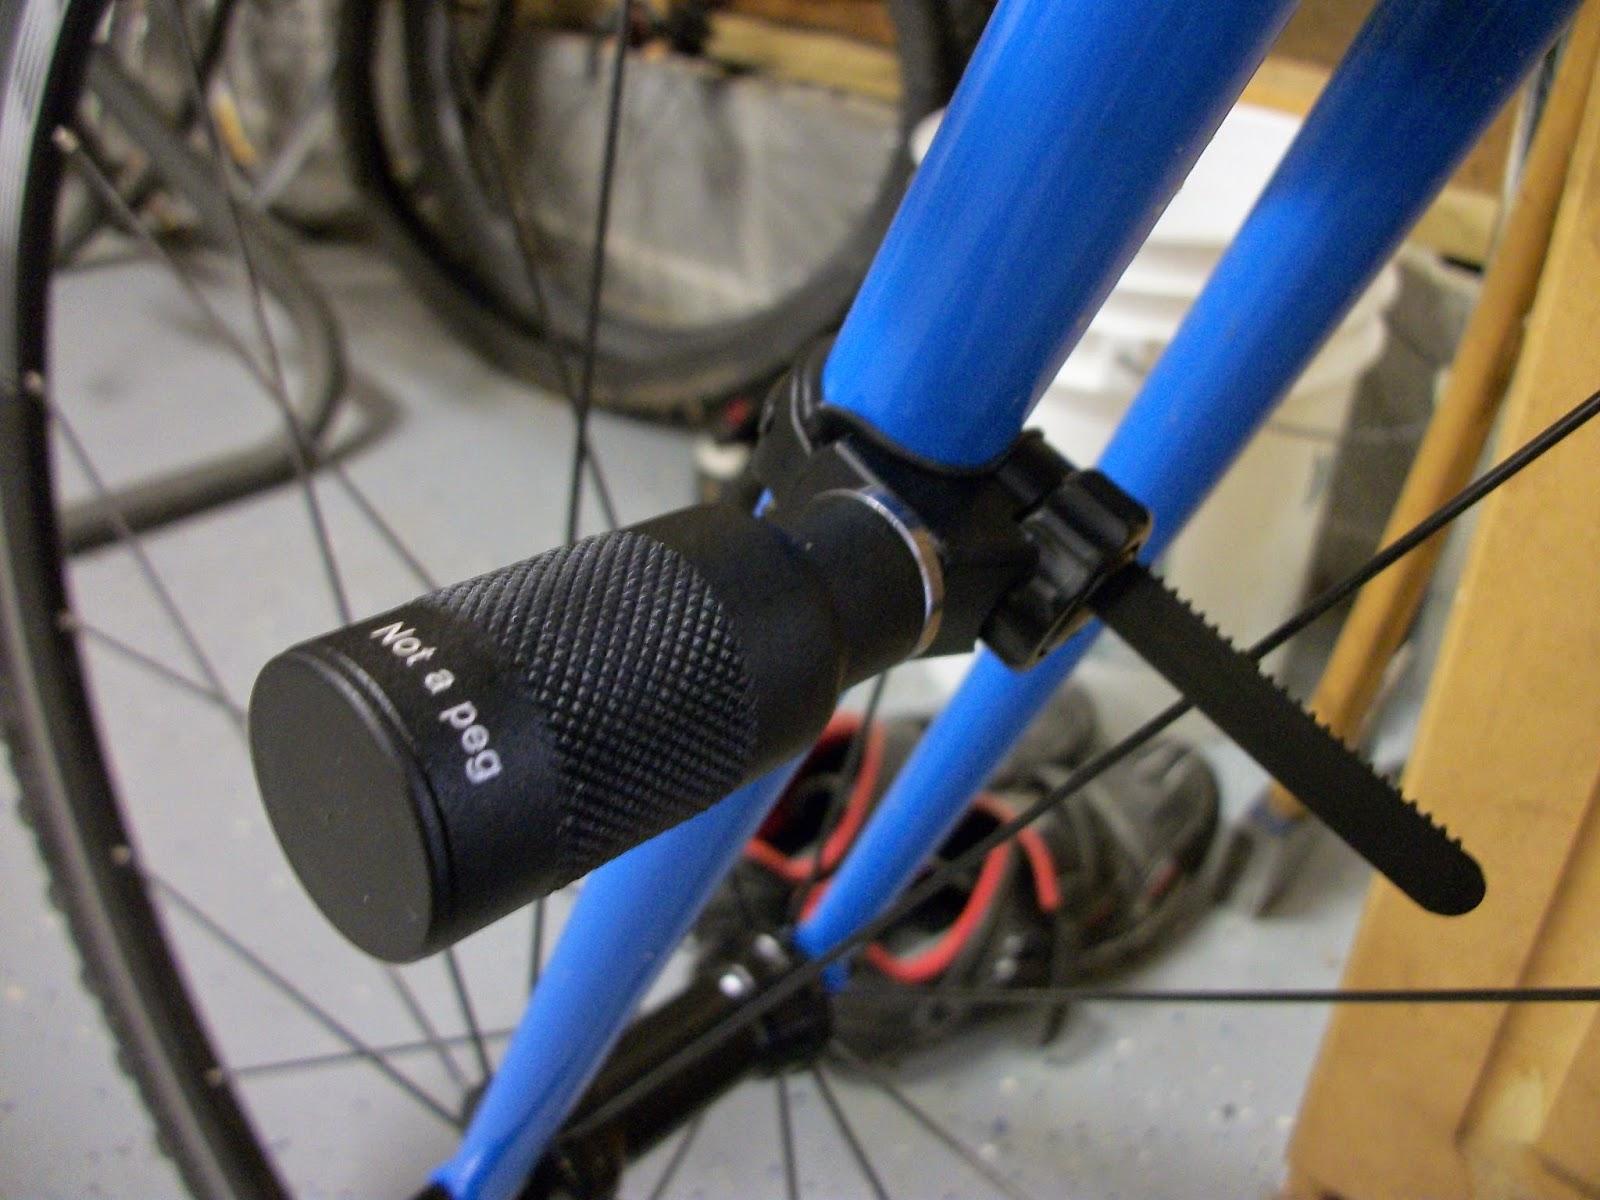 BIKEWRIGHT: DIY Fork Bike Light Mount